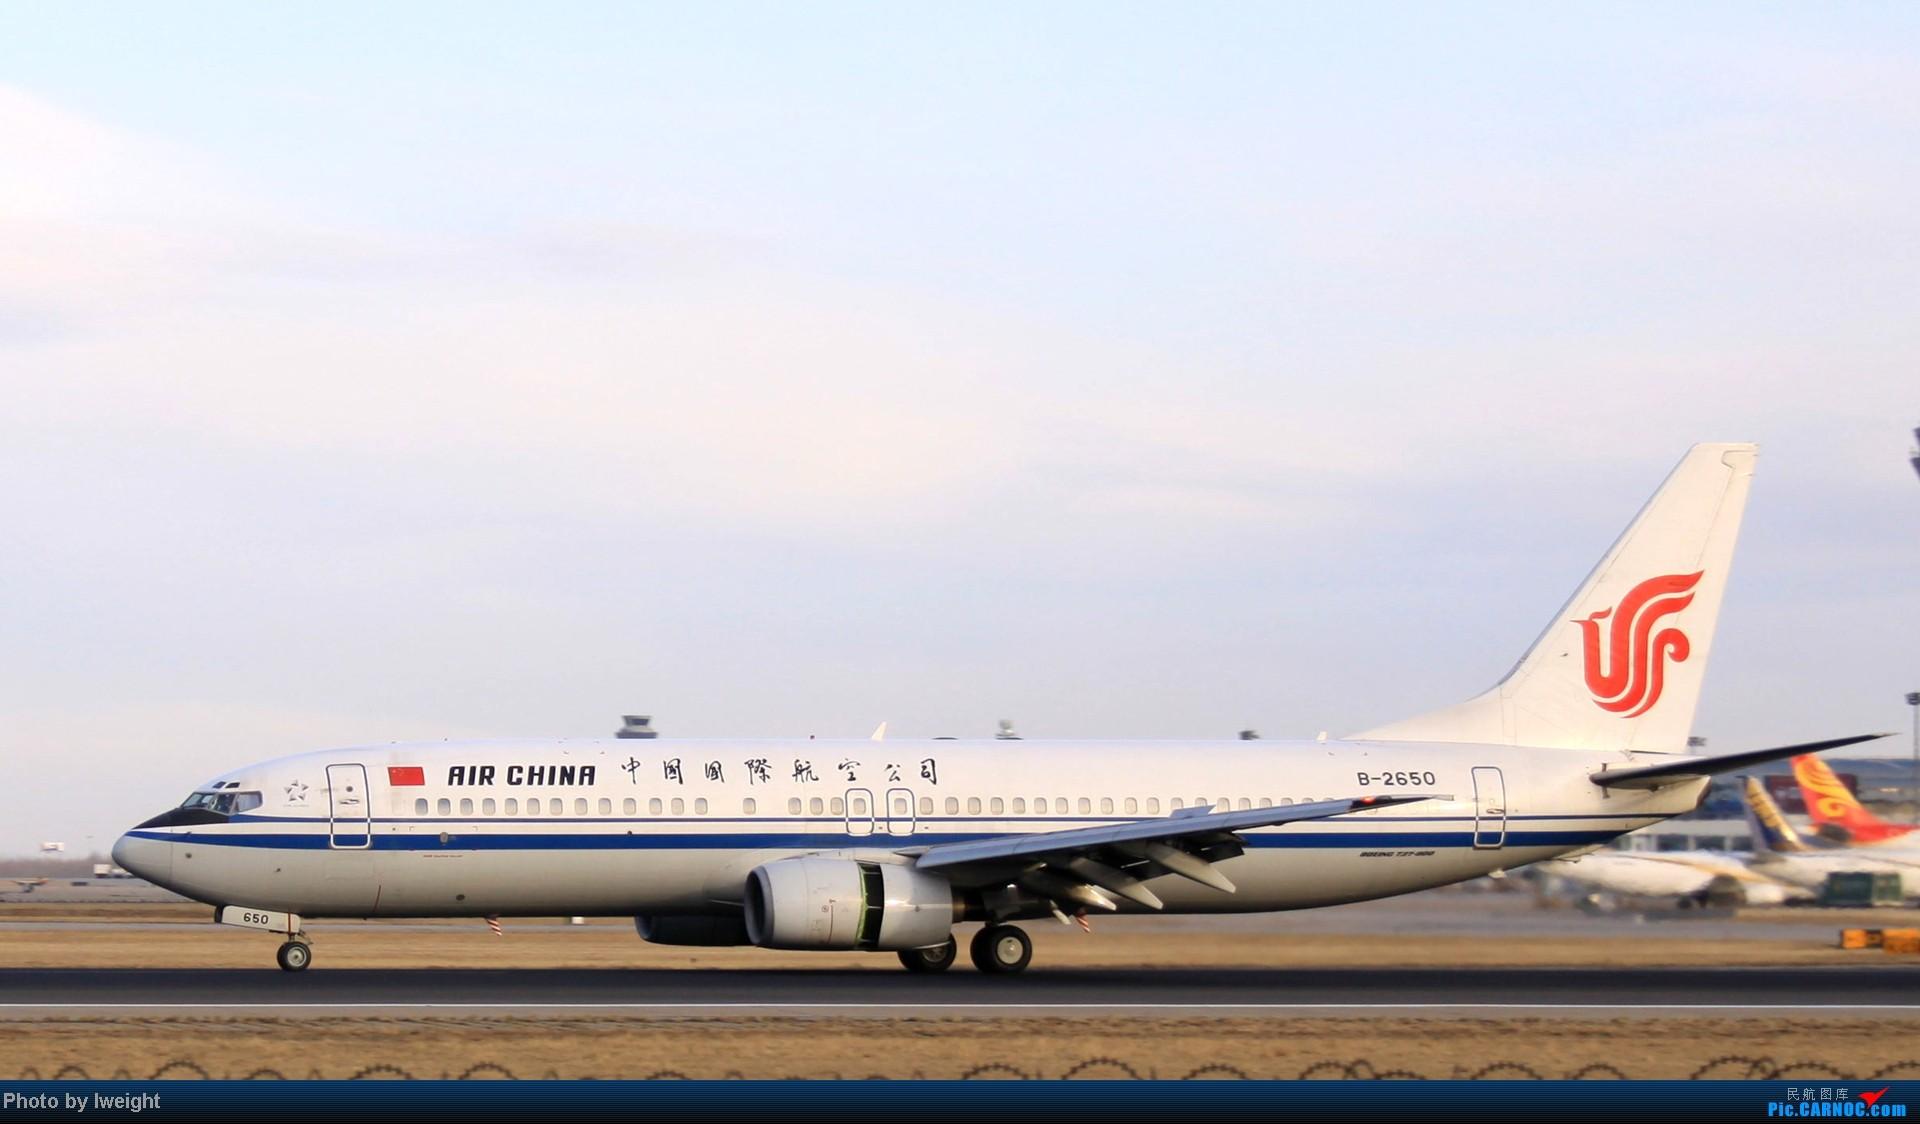 Re:[原创]今天下午瞎拍两个小时的杂图 BOEING 737-800 B-2650 中国北京首都机场